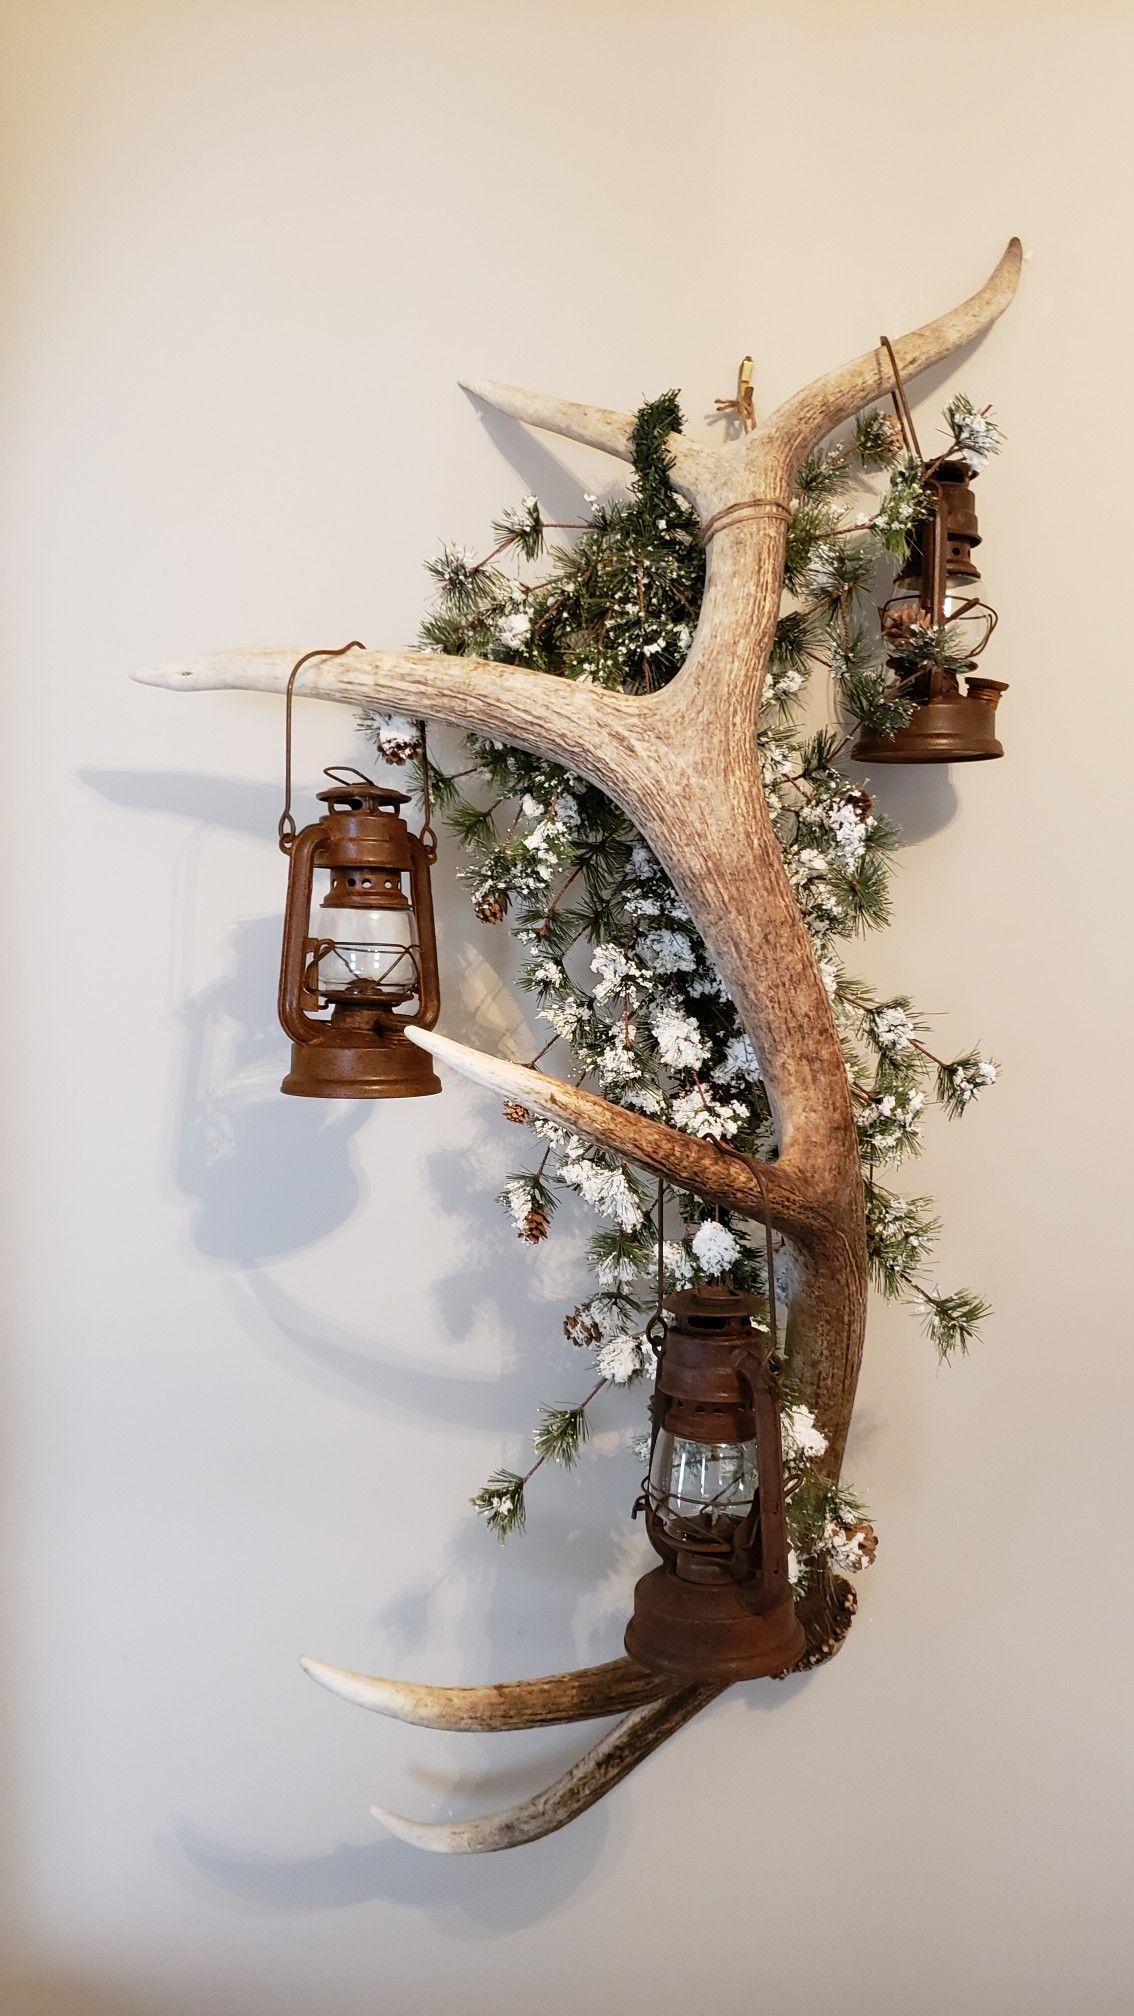 Elk antler lantern hanger